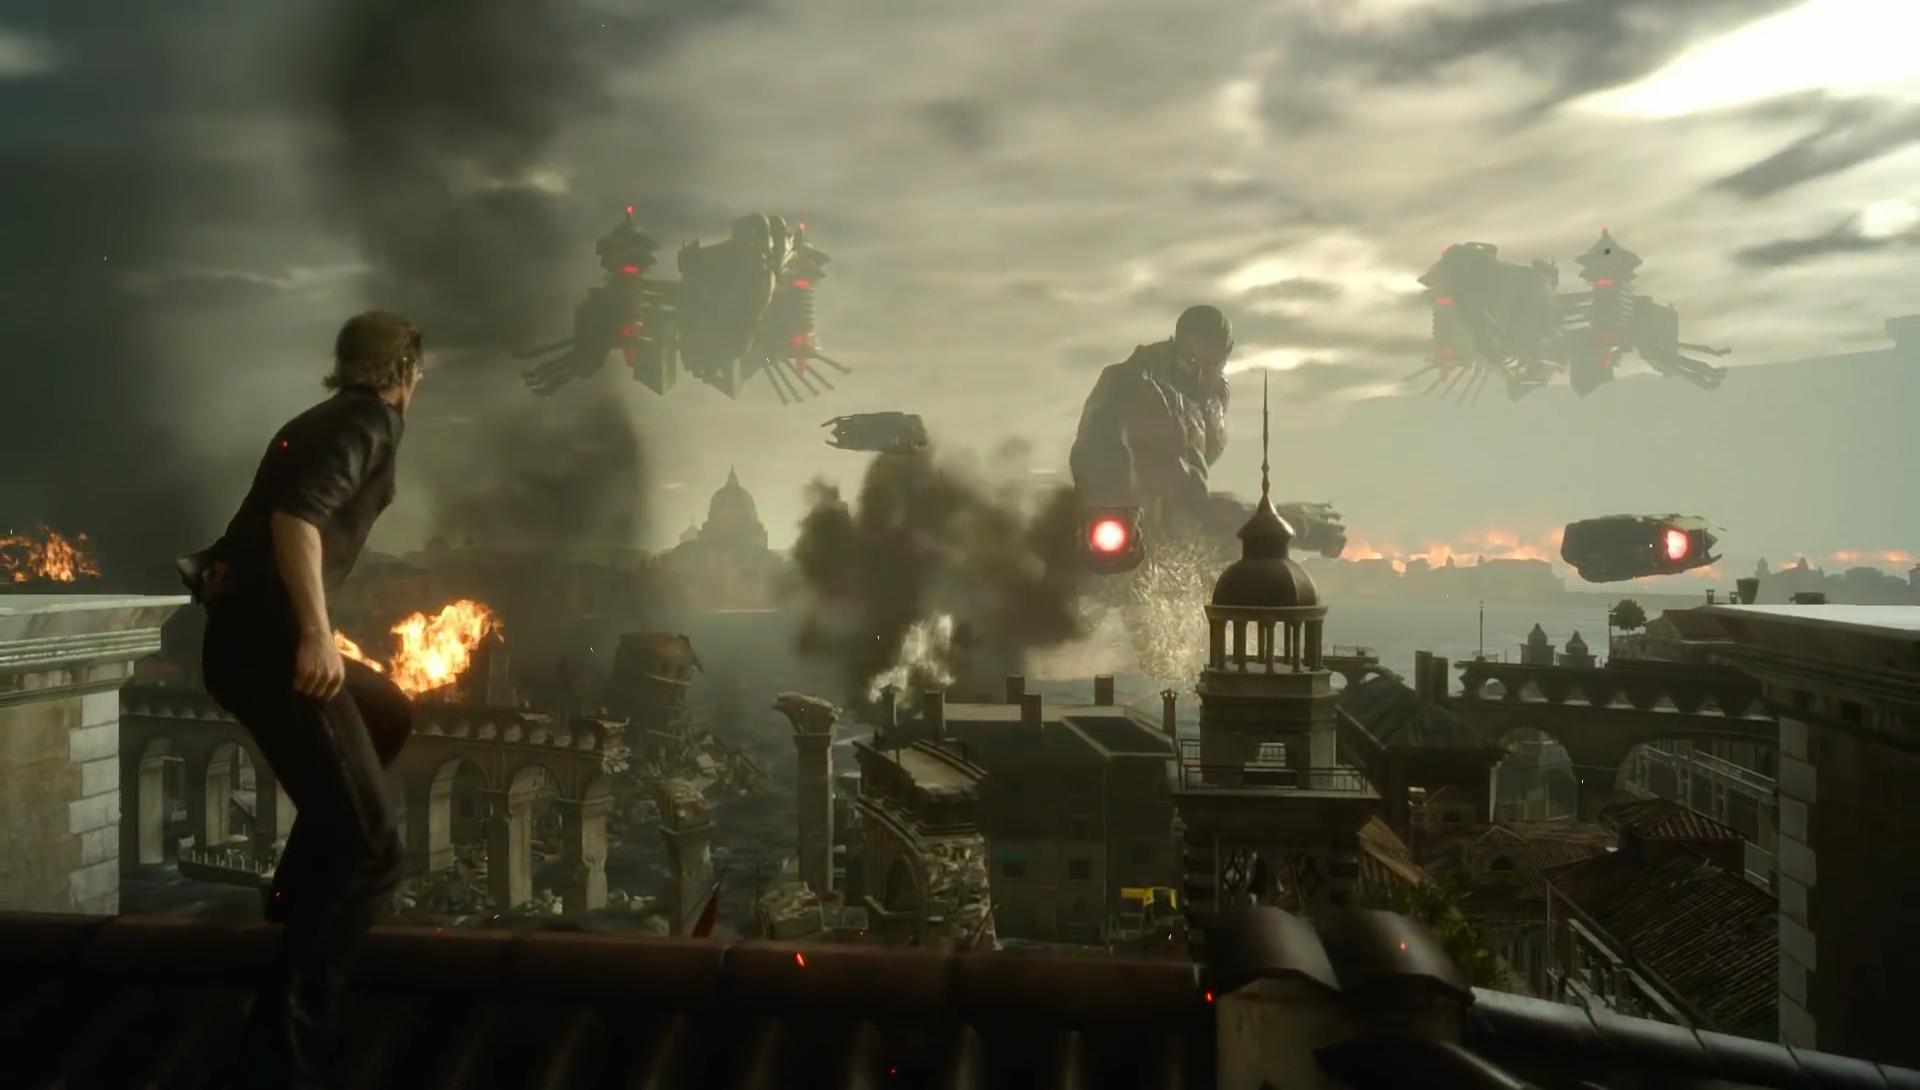 Final Fantasy XV Episode Ignis Review (PS4) - Rice Digital